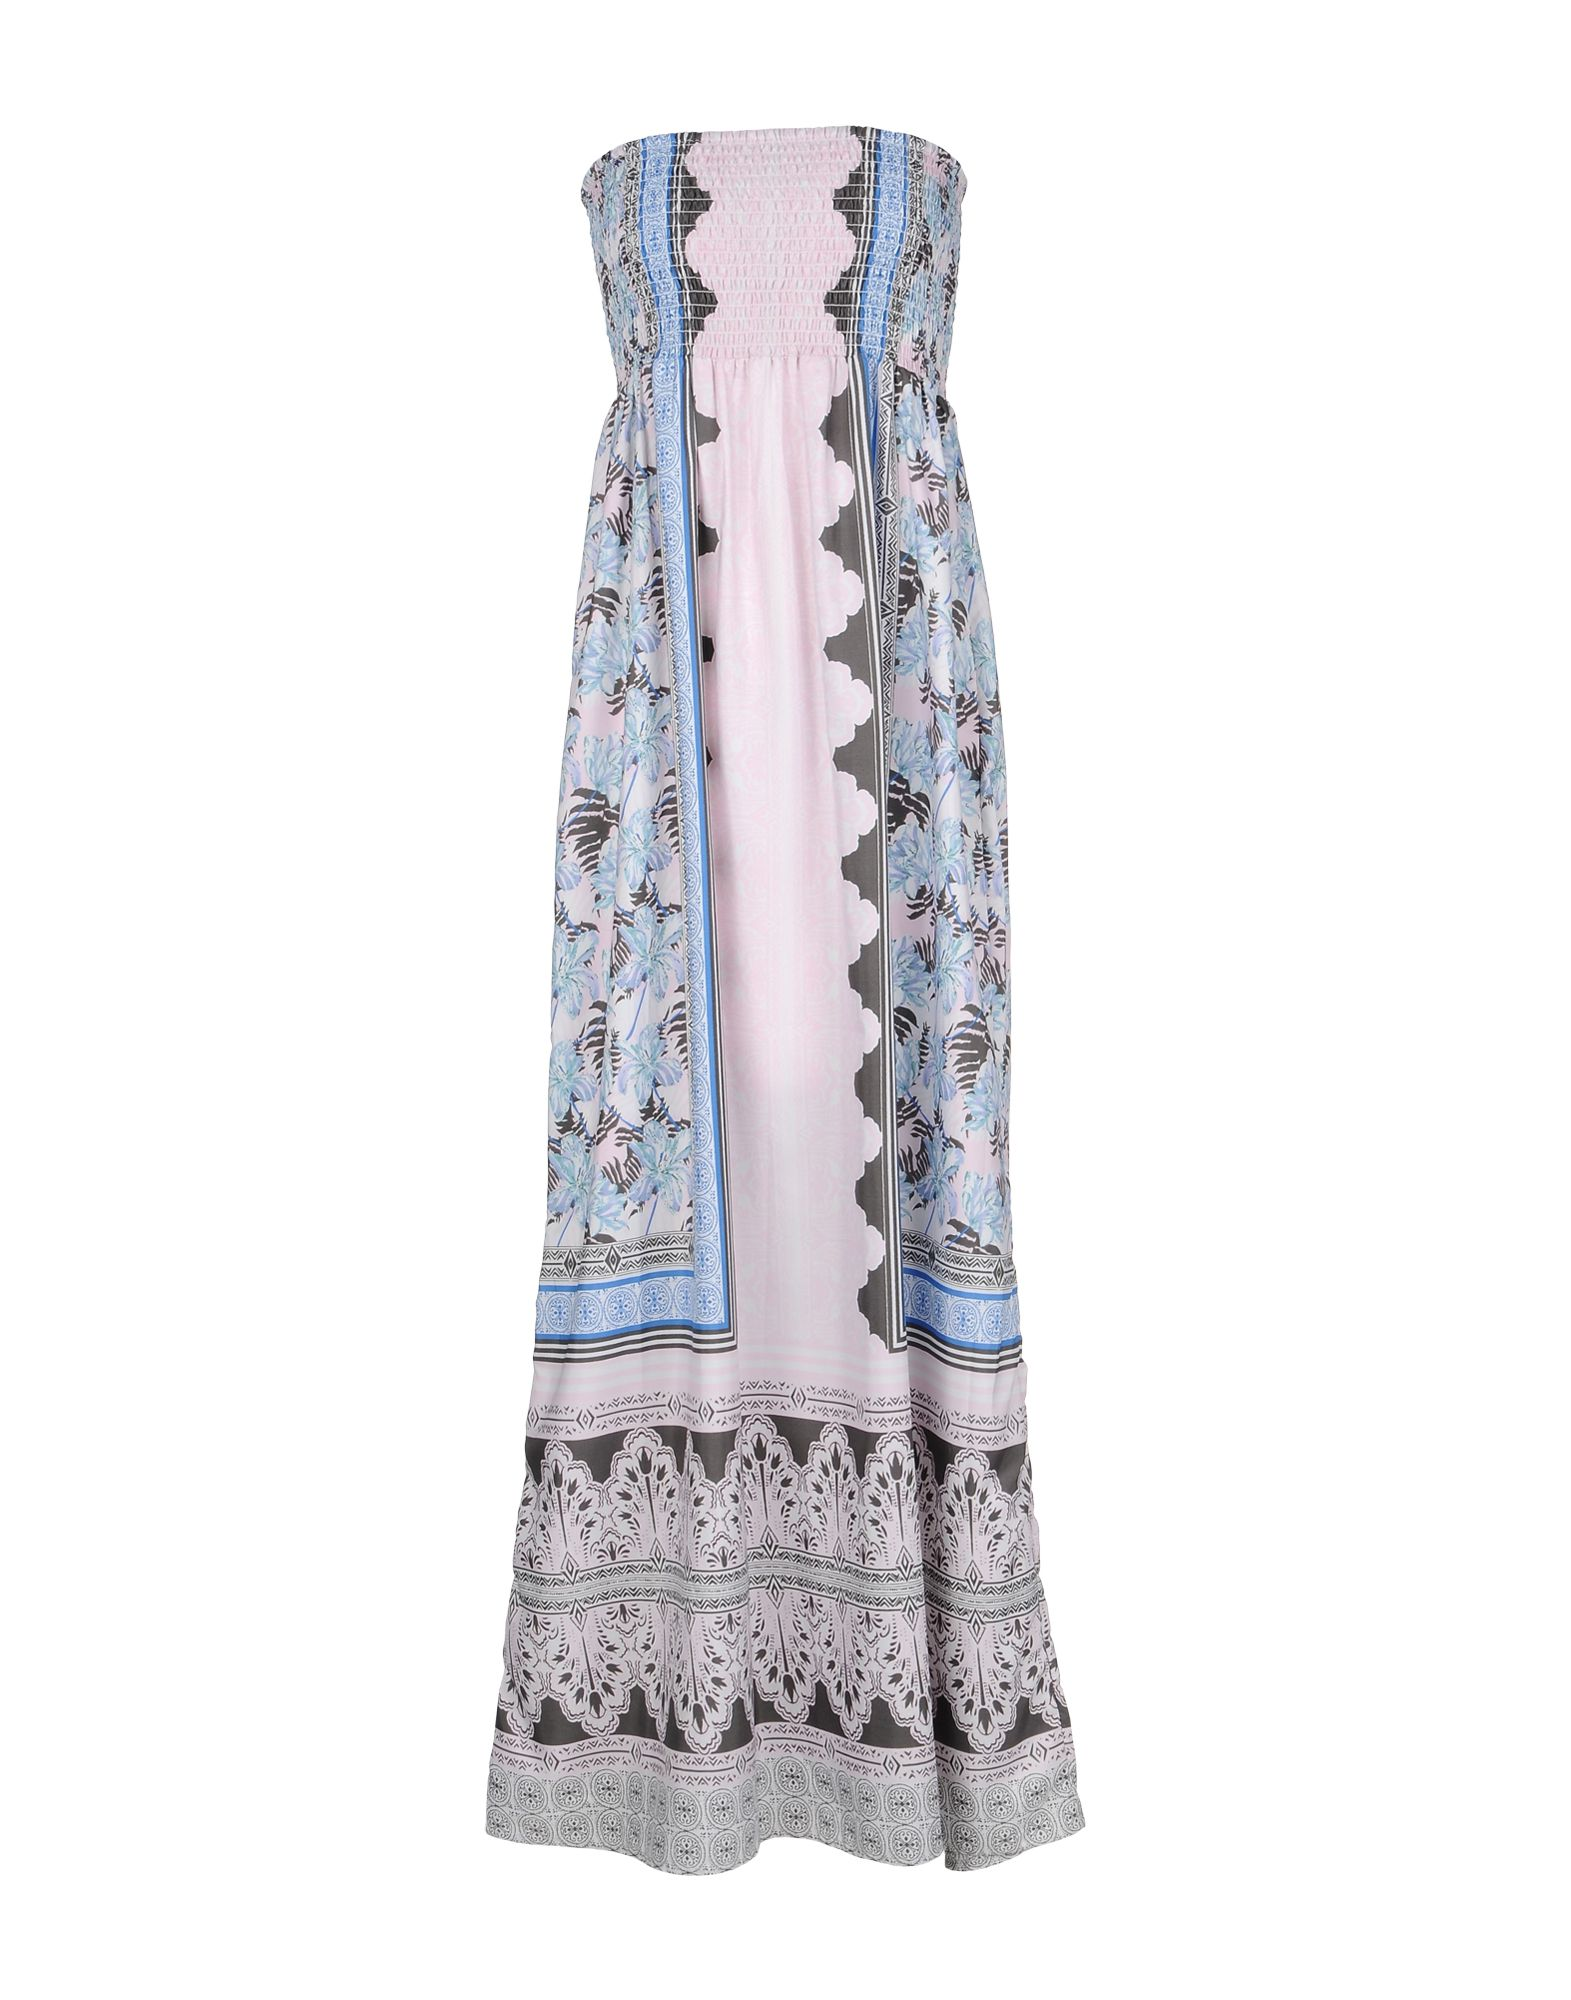 SILVIAN HEACH Длинное платье платье длинное с рисунком пейсли